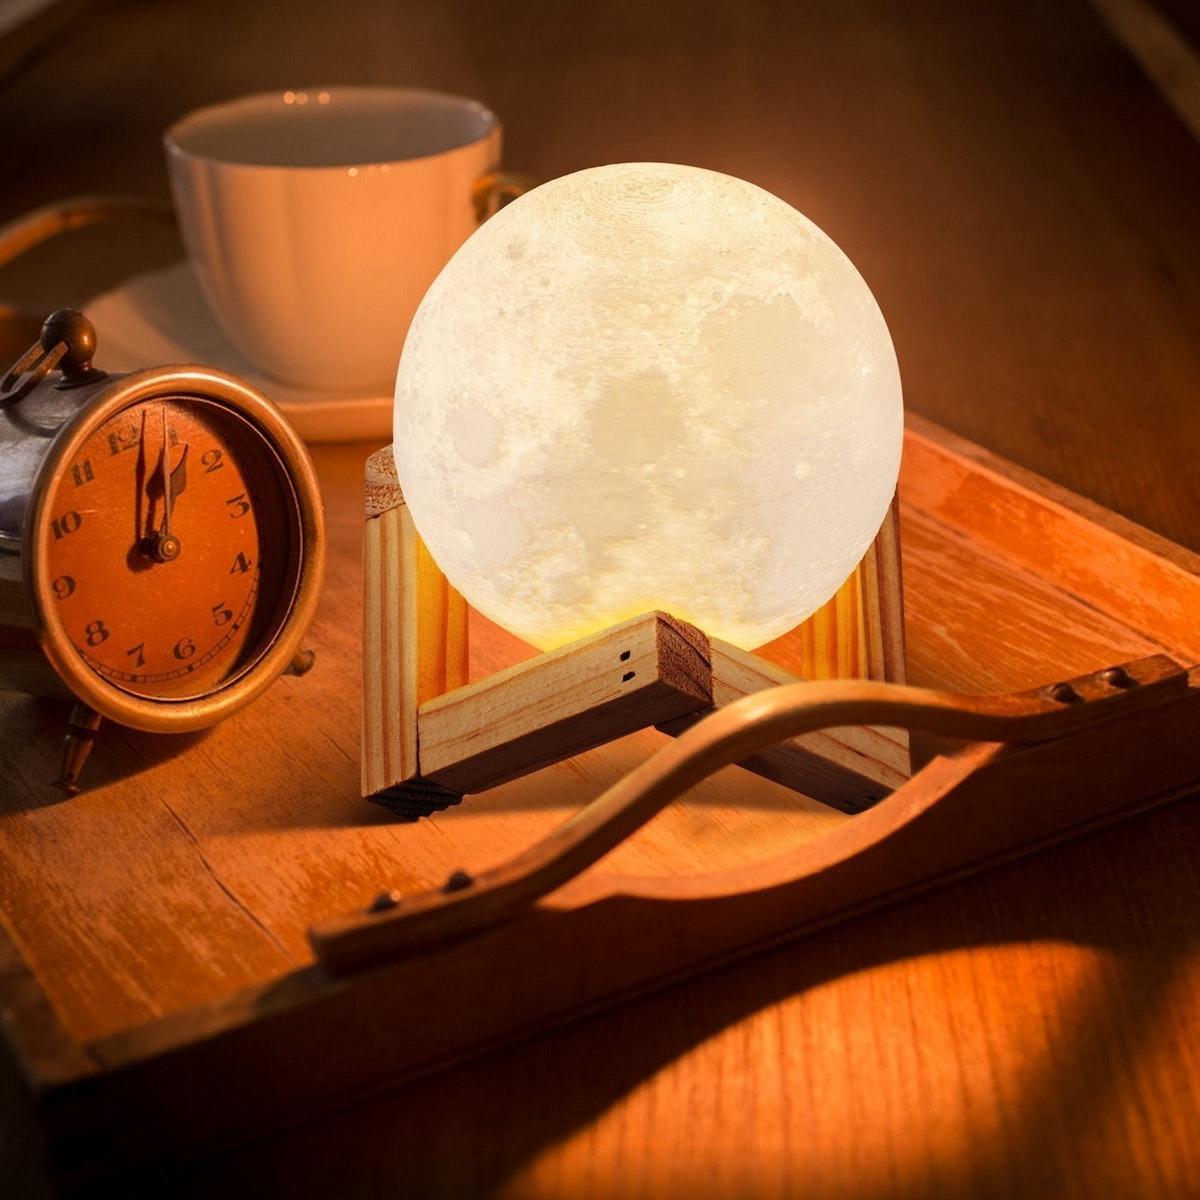 RMFSH ACED Luna Moon Lamp Night Light